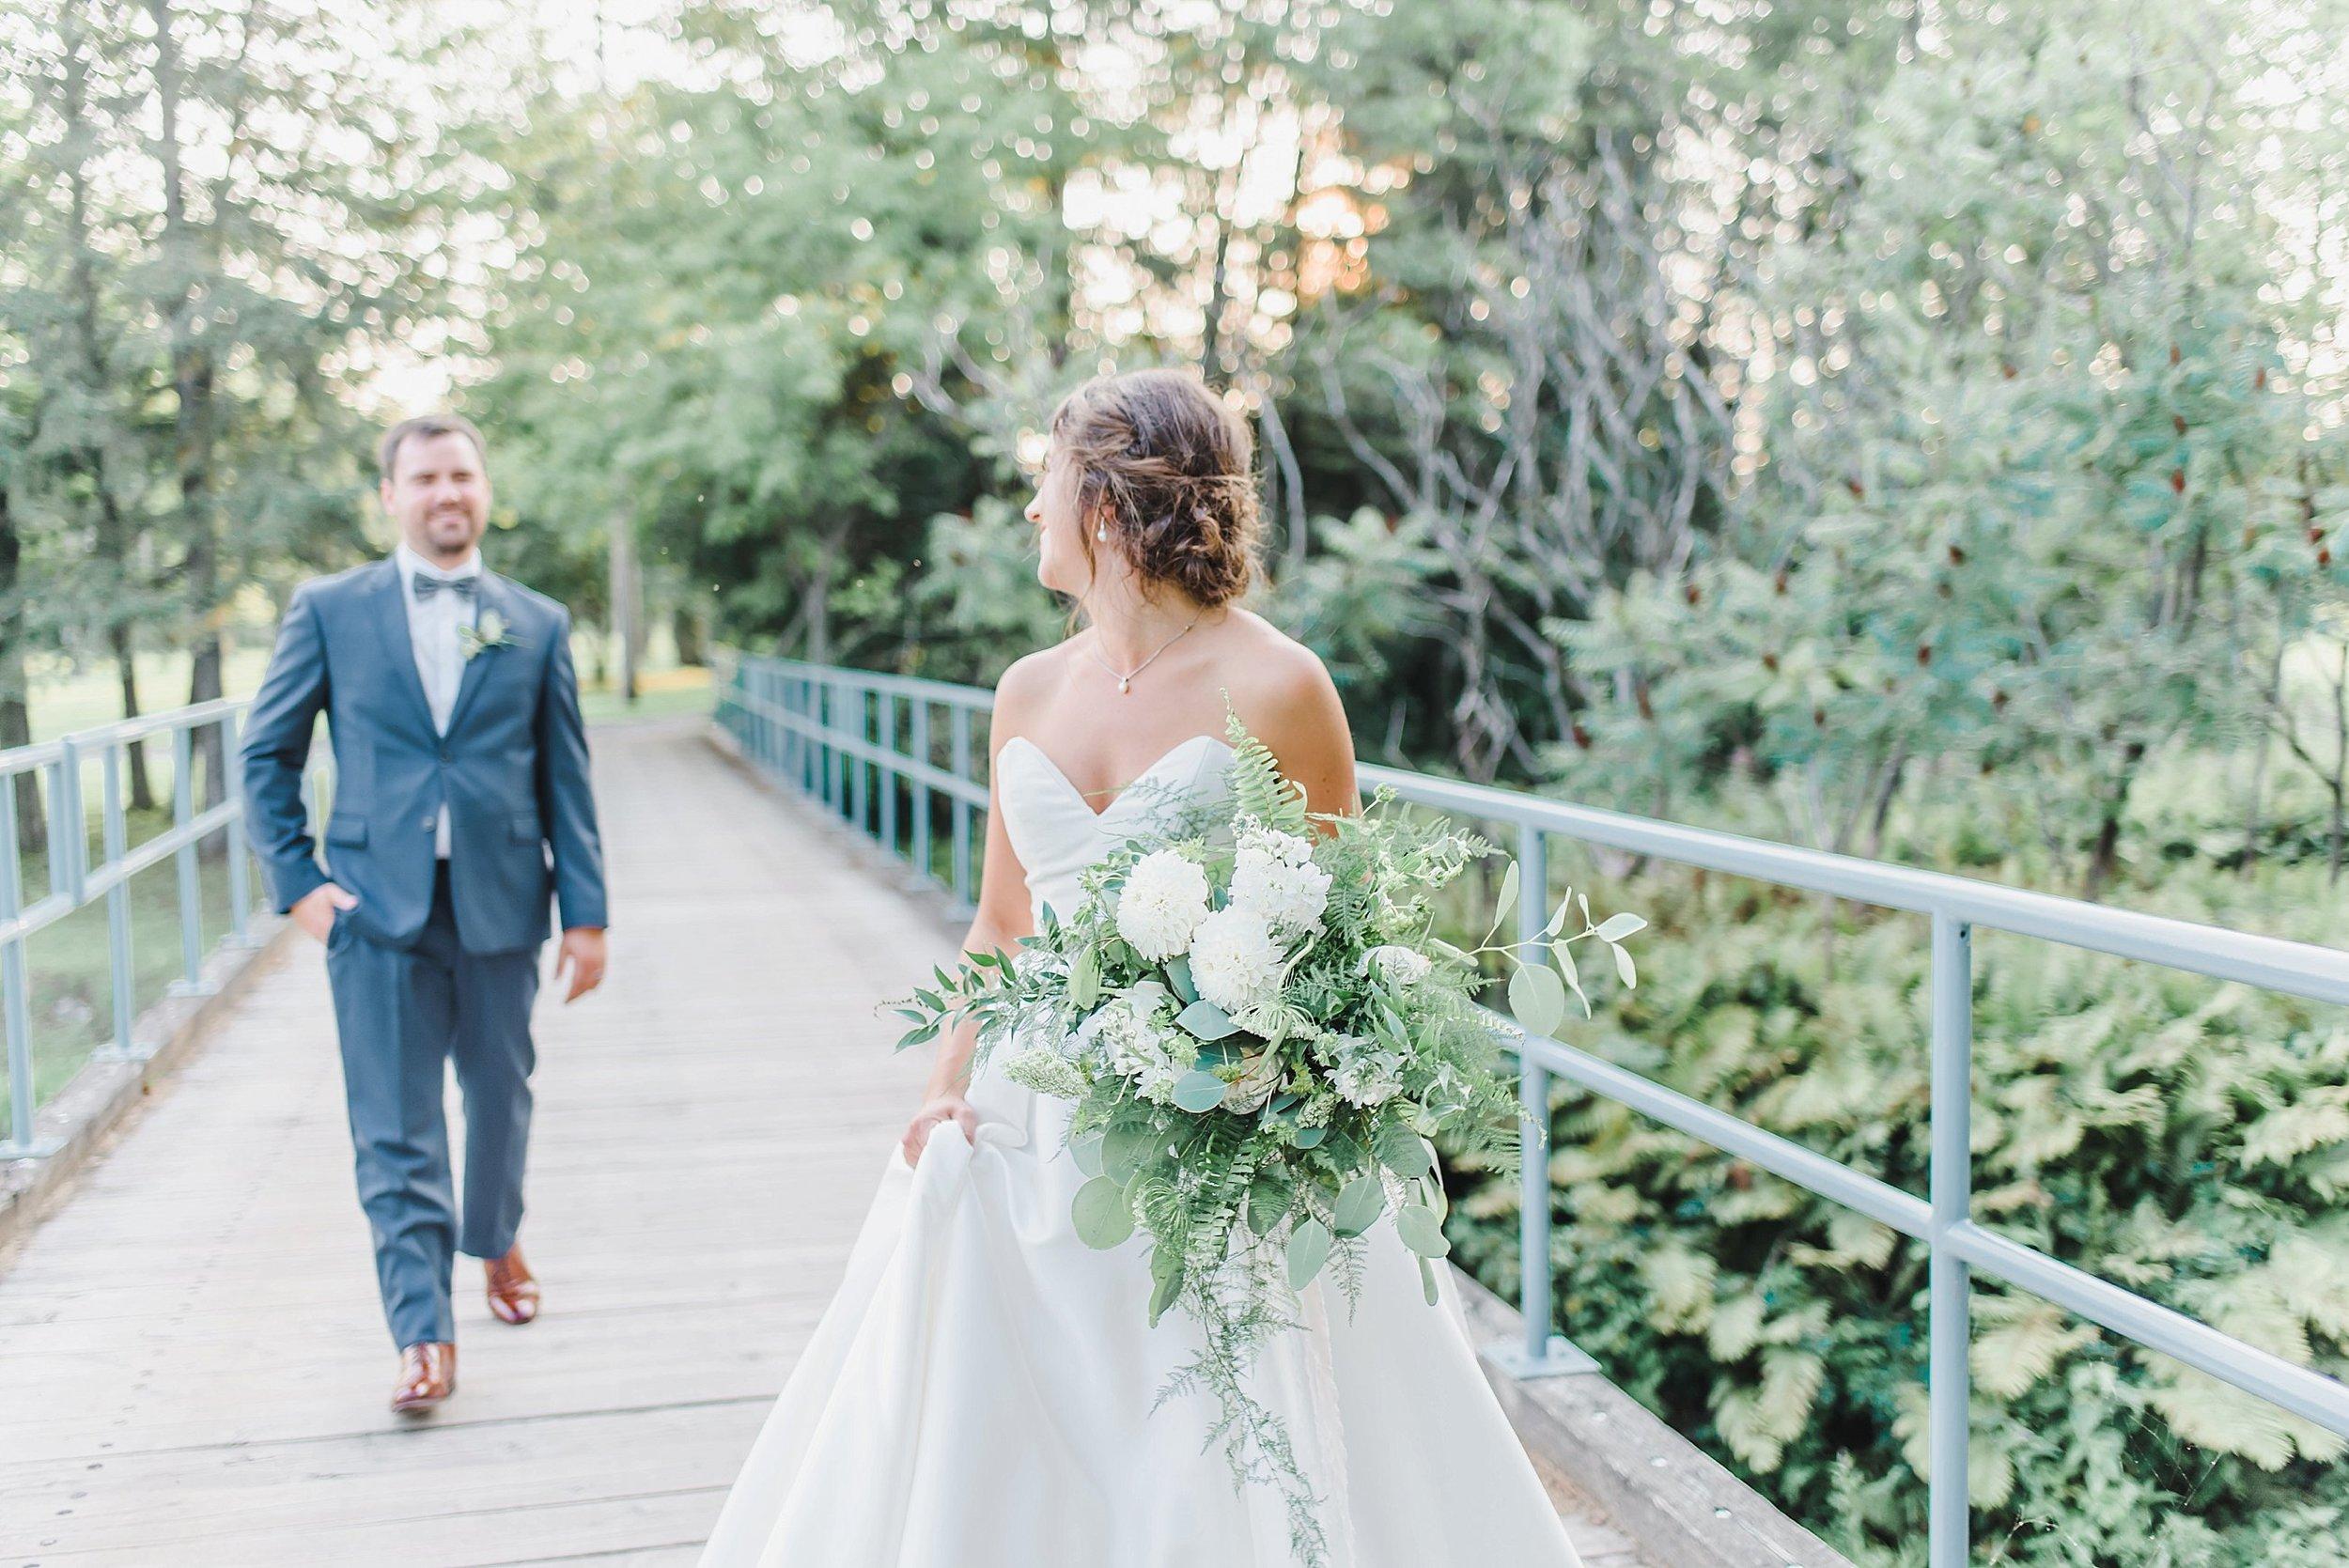 light airy indie fine art ottawa wedding photographer | Ali and Batoul Photography_0568.jpg